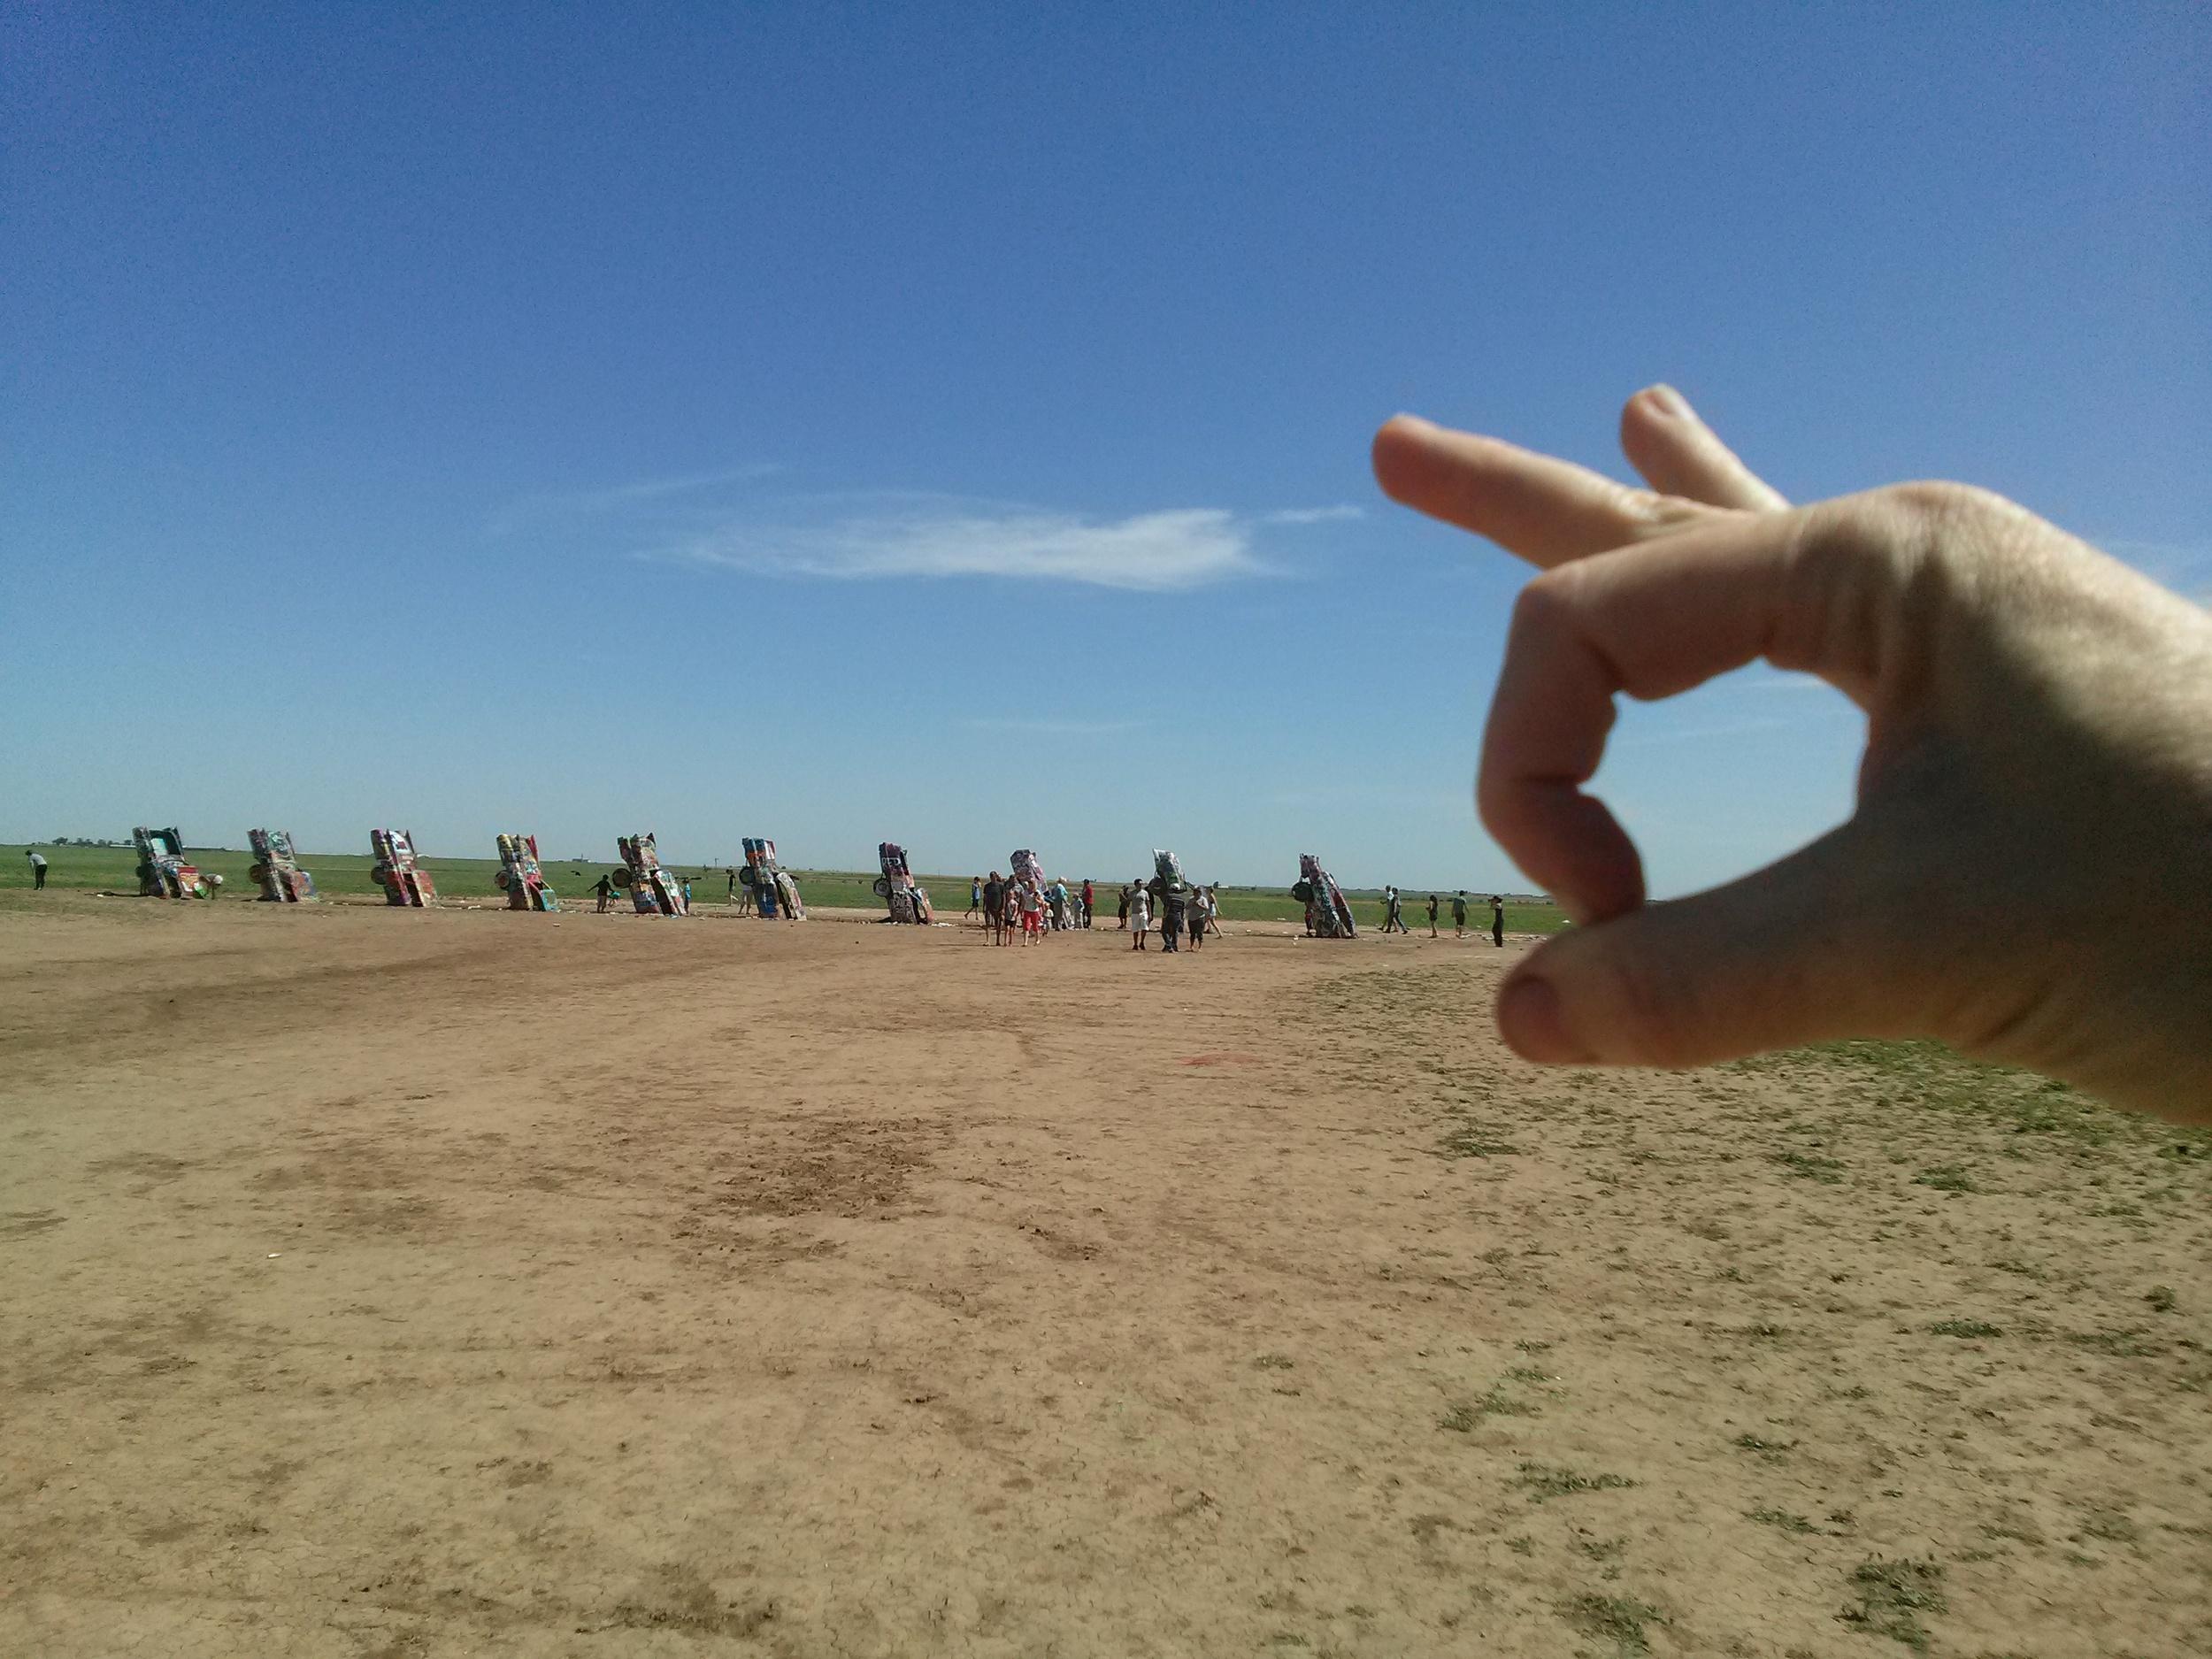 SR--Day3 - Cadillac Ranch, Amarillo, Tx (3).jpg